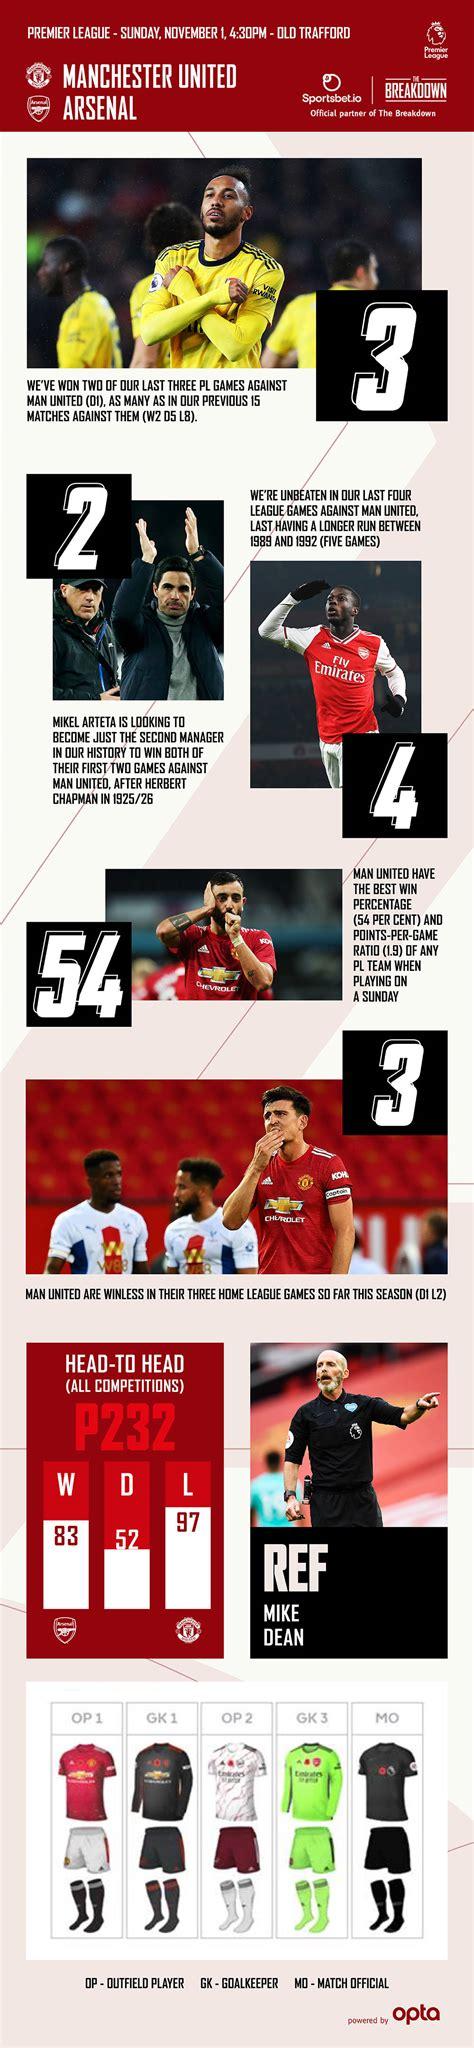 Man Utd v Arsenal preview: Stats, goals, graphics | Pre ...